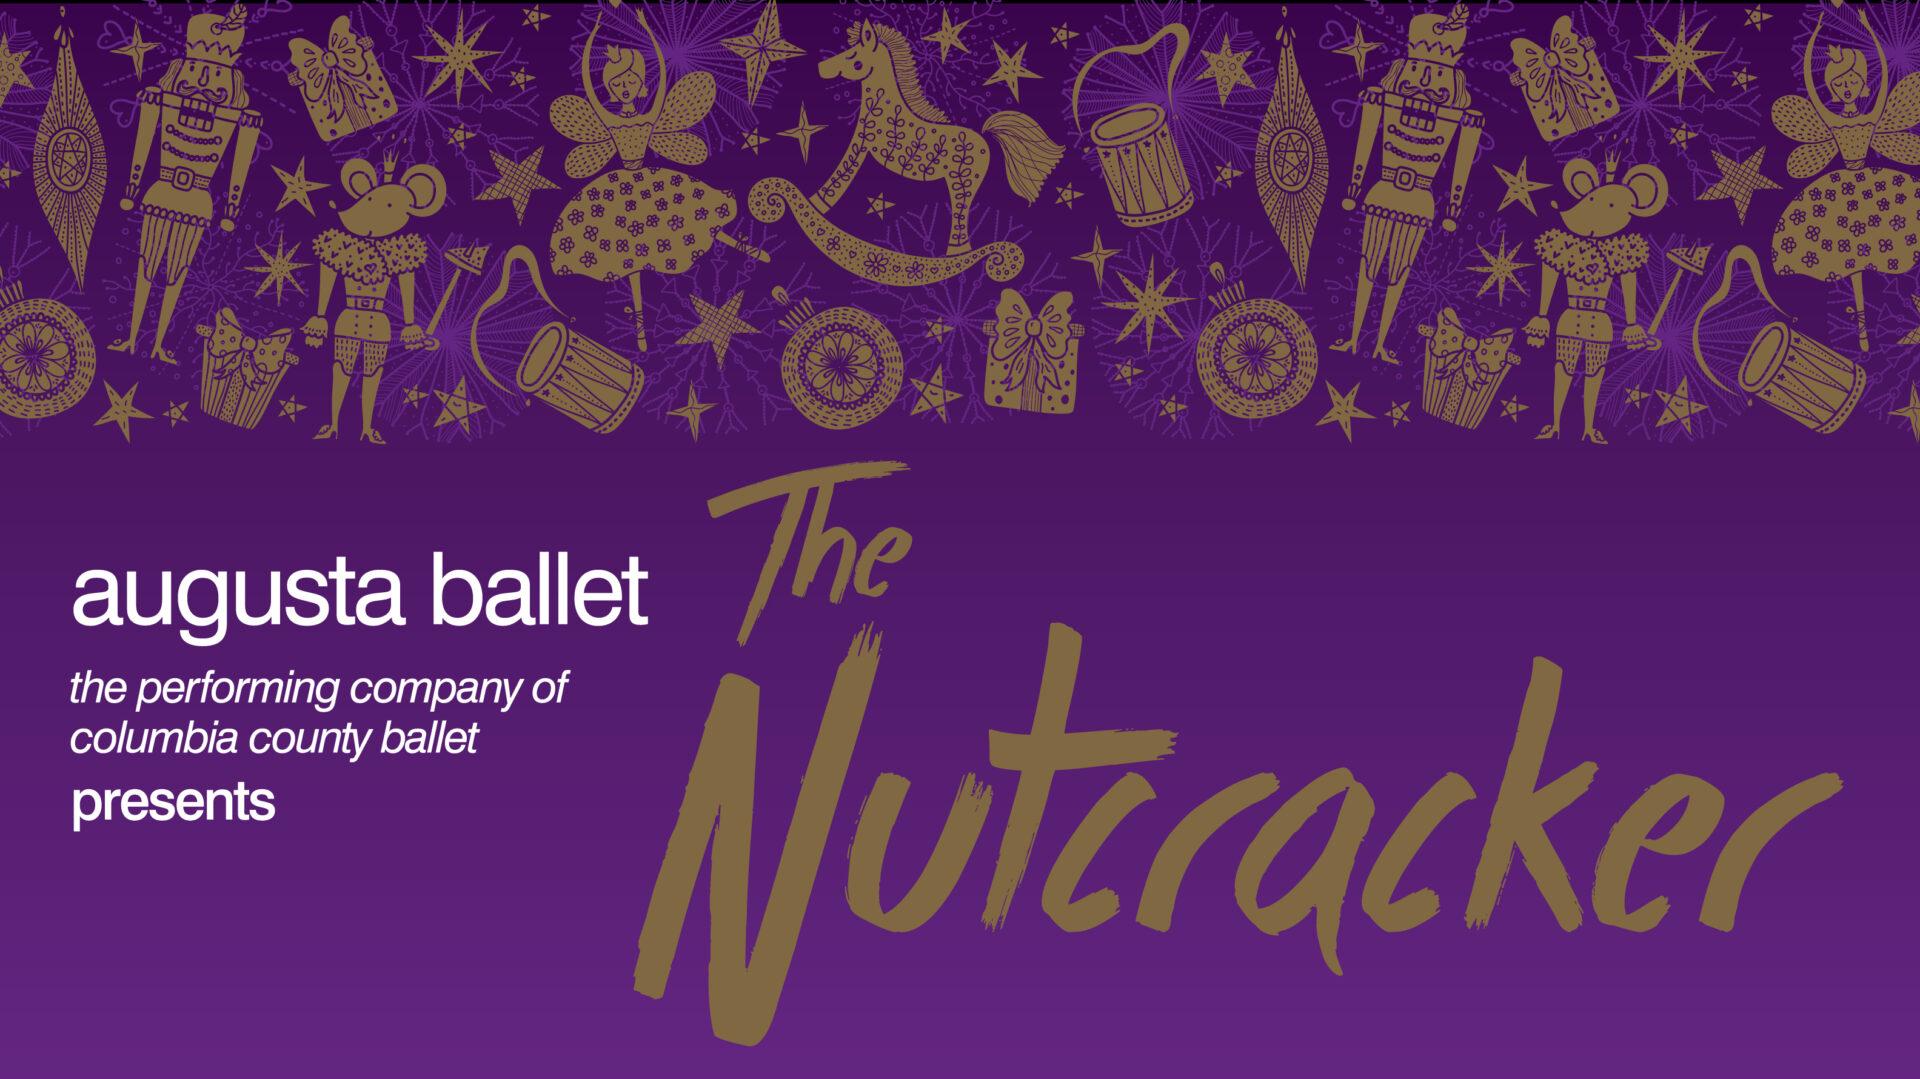 Nutcracker 2021 graphic from Ruskin